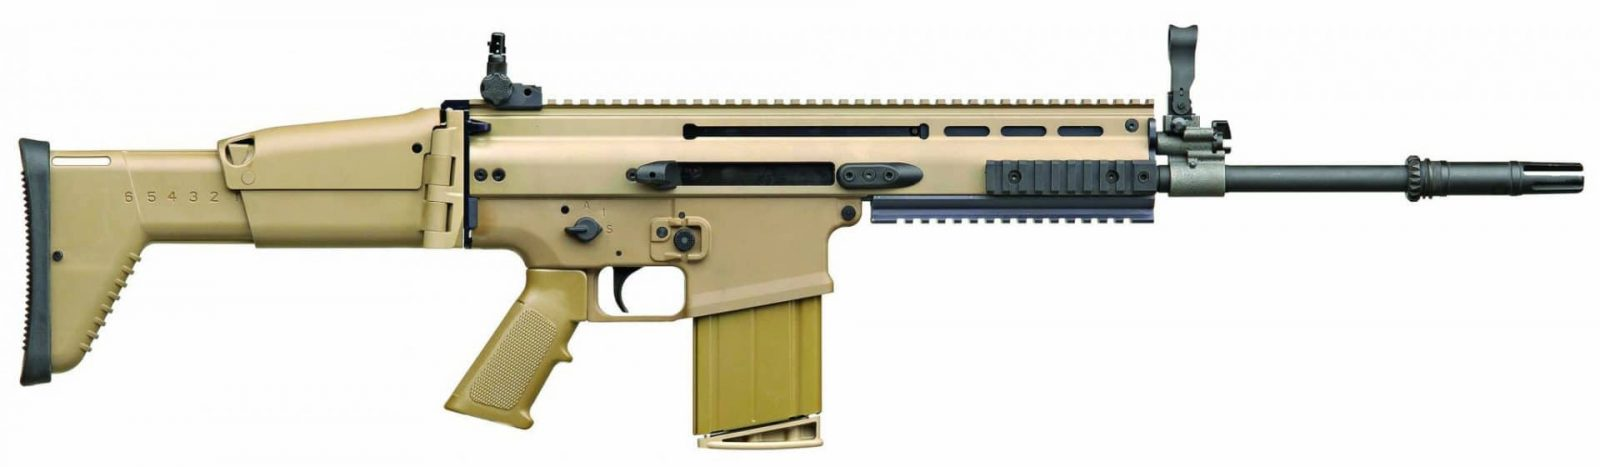 Guns of G.I. Joe: Retaliation -  SCAR-H